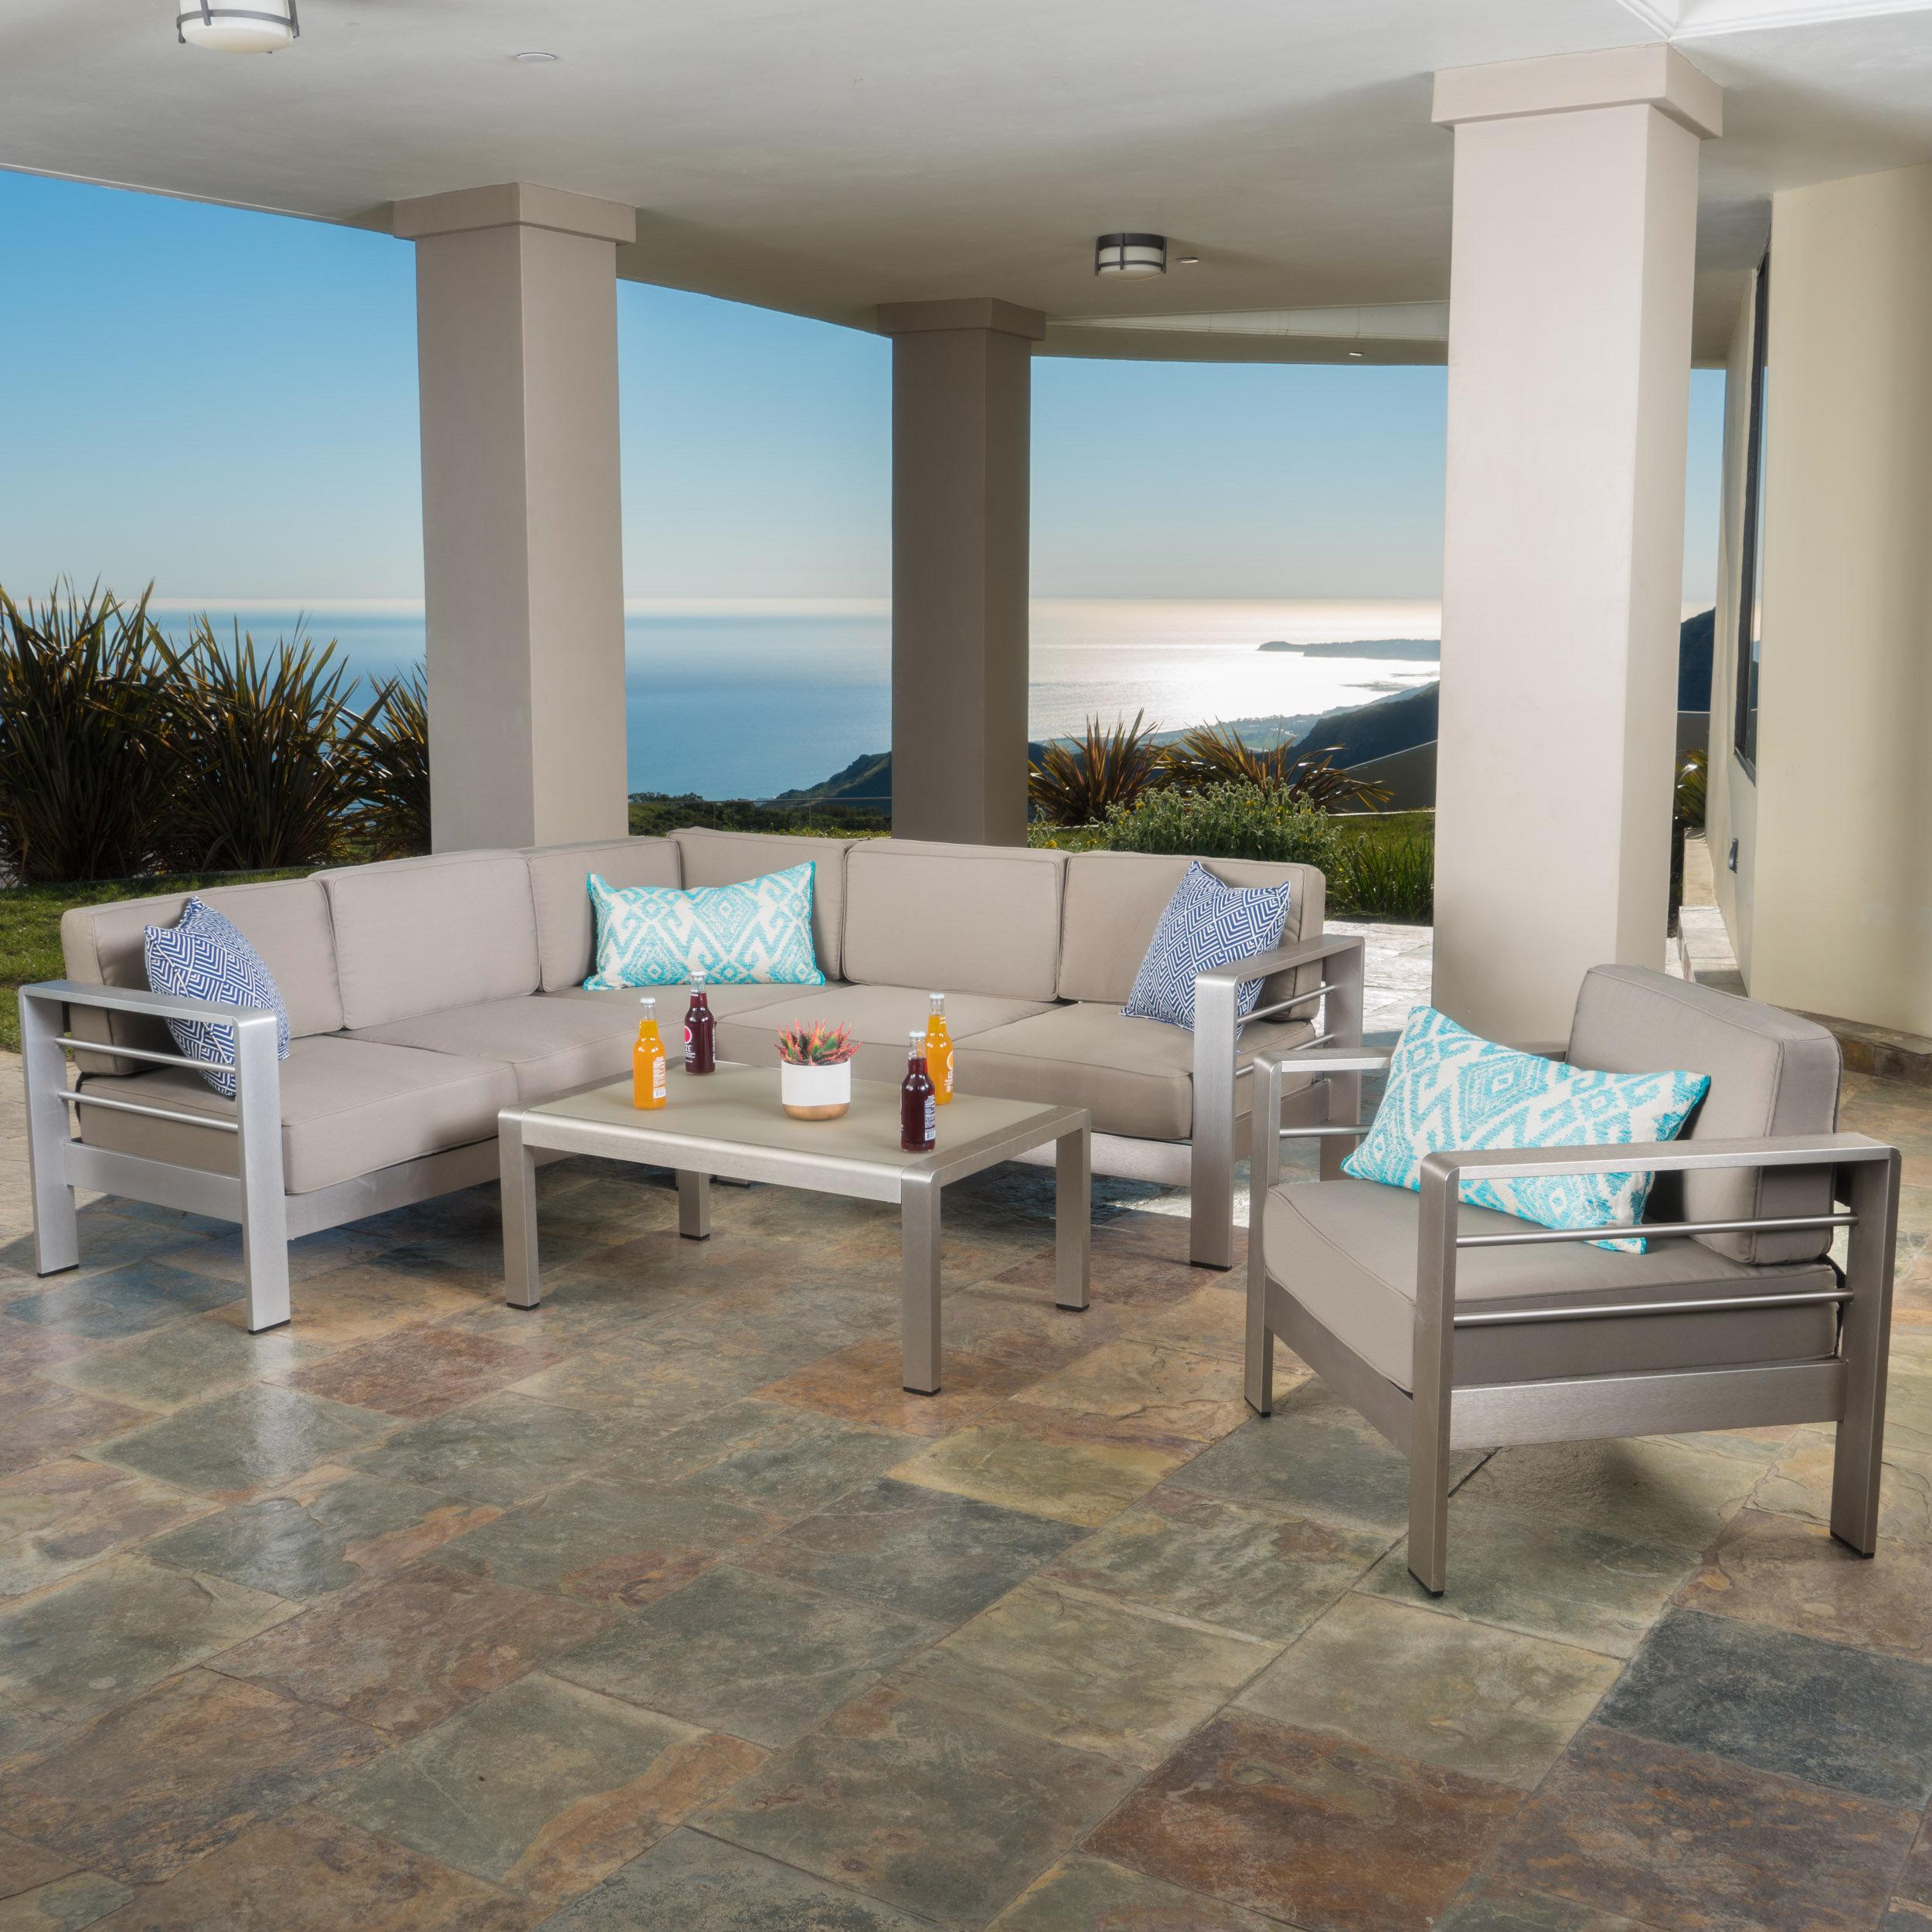 pdx catnapper furniture radley reclining siesta sectional